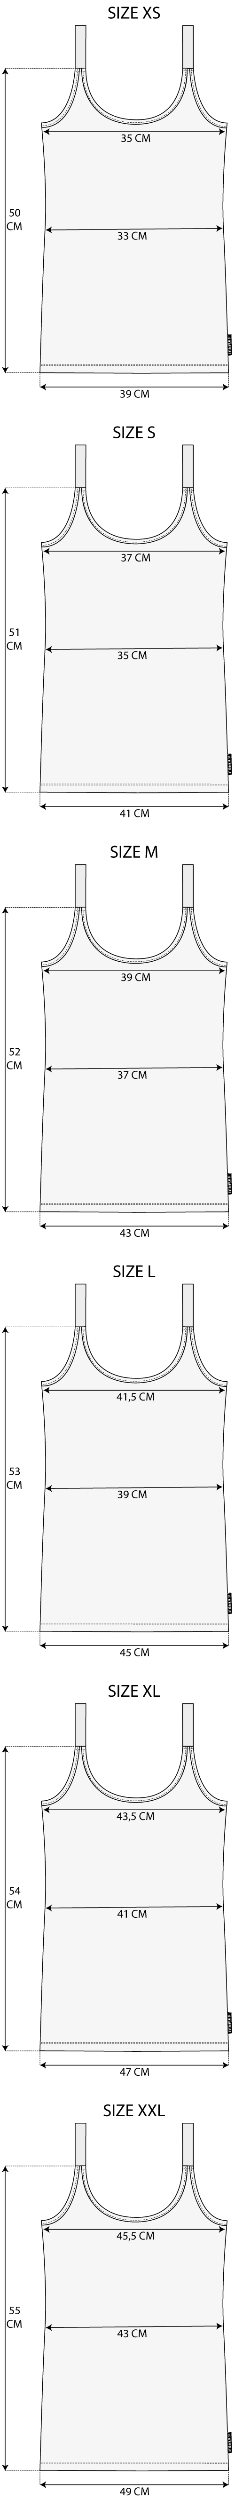 Maattabel Tank